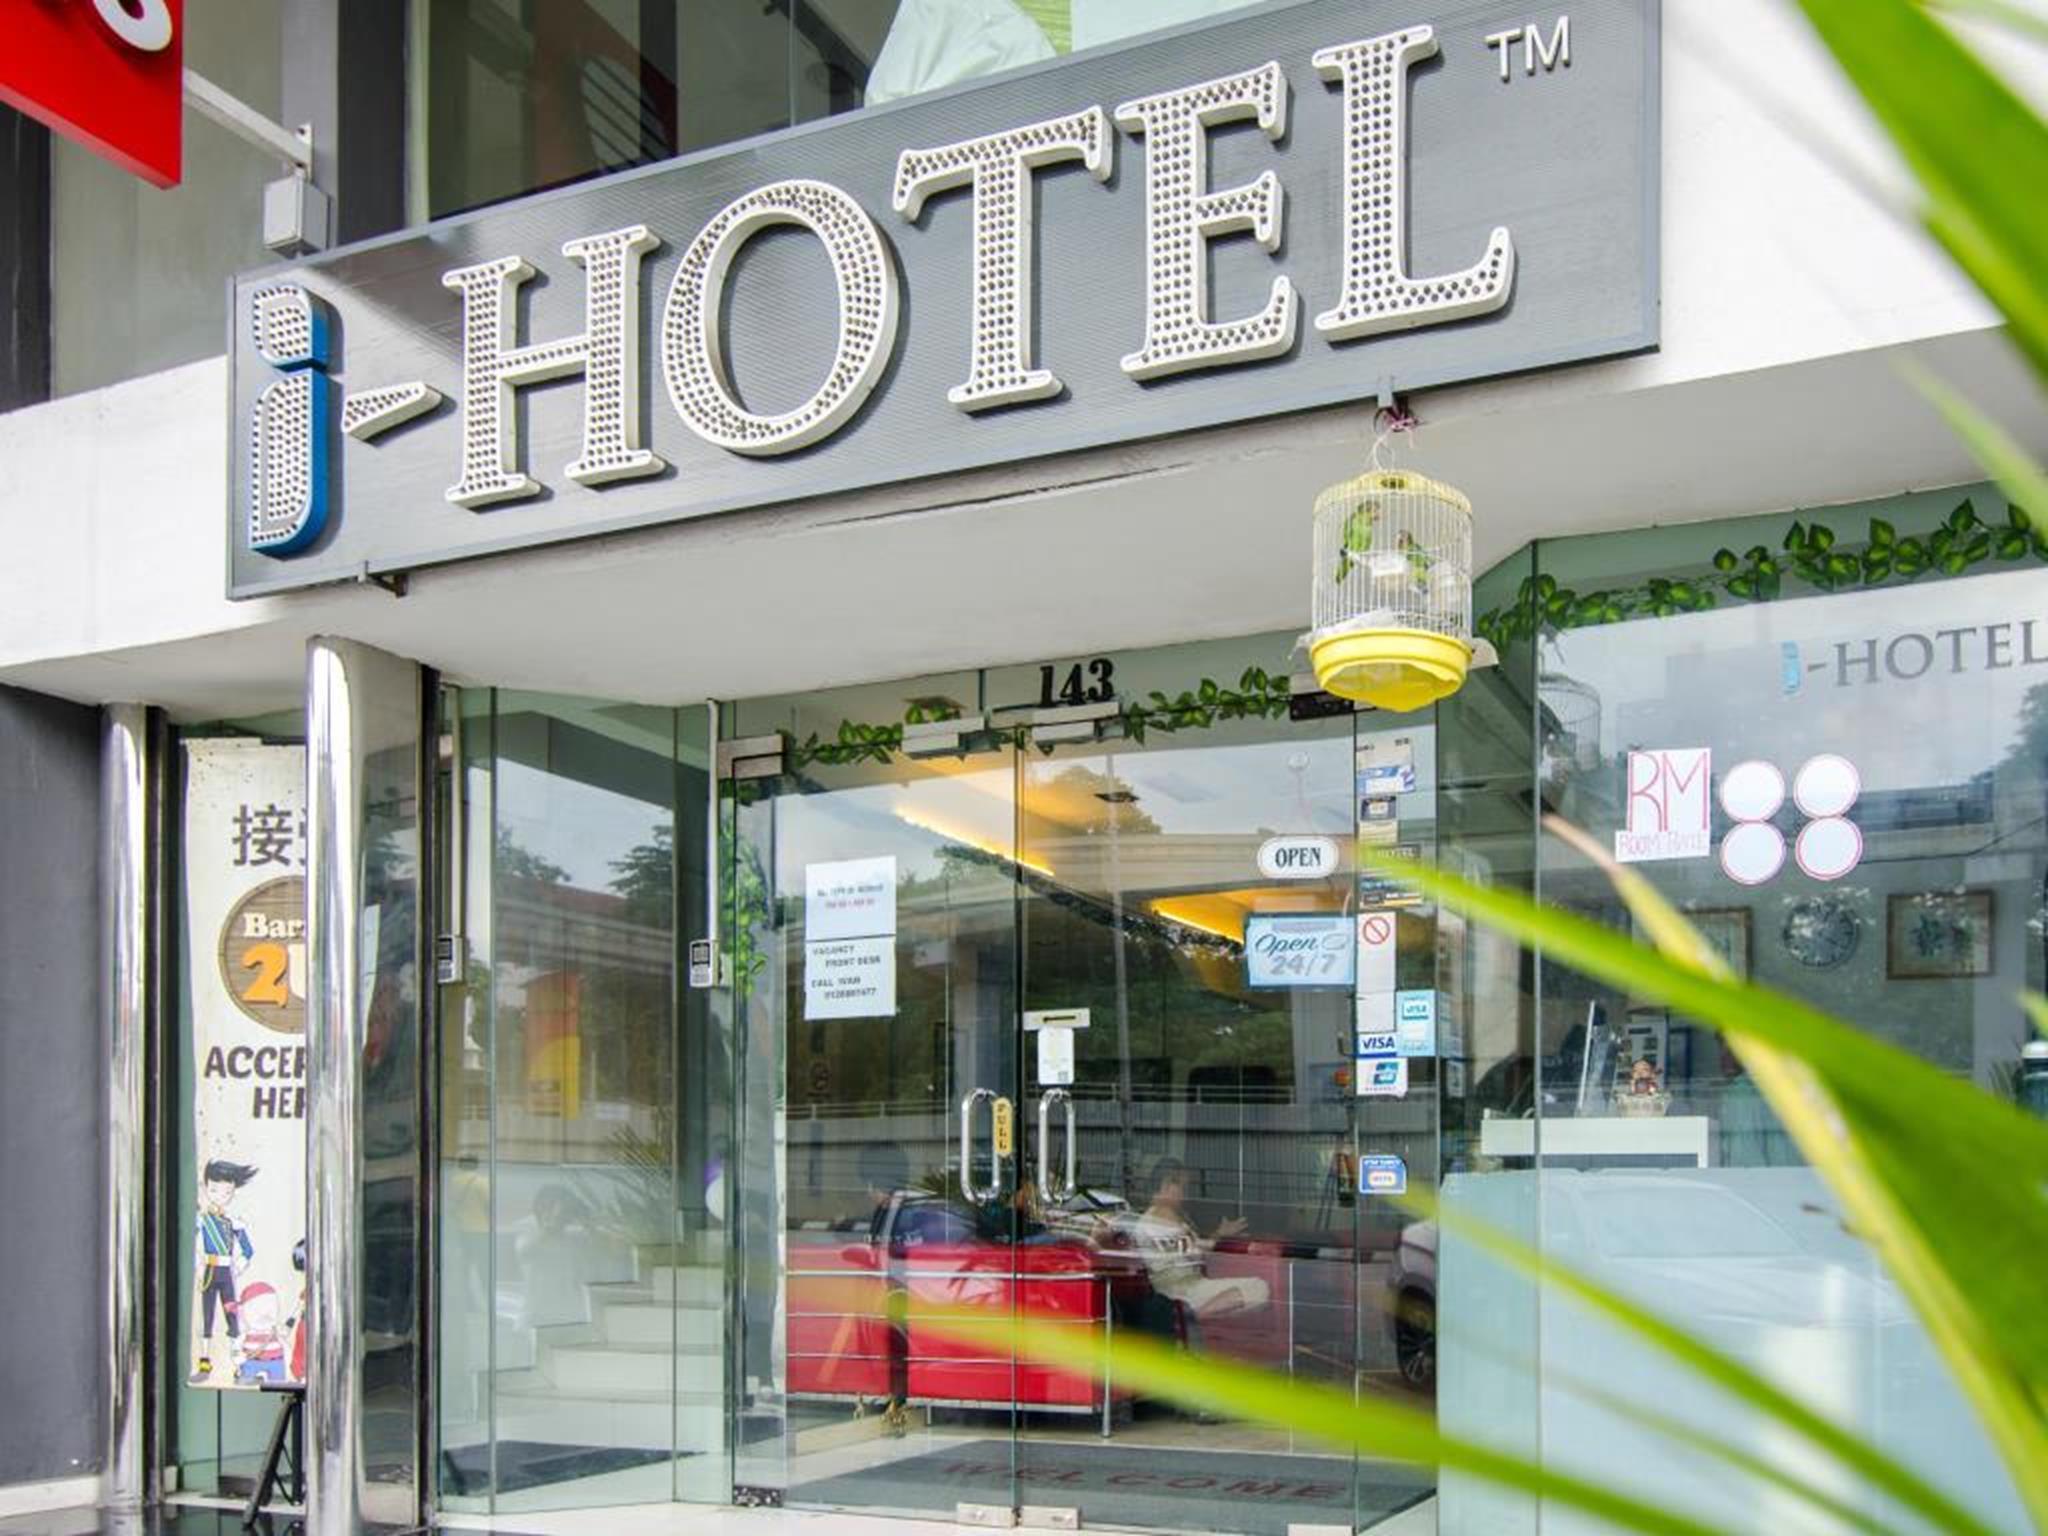 I Lux Hotel @ i-Hotel Kuala Lumpur, Kuala Lumpur